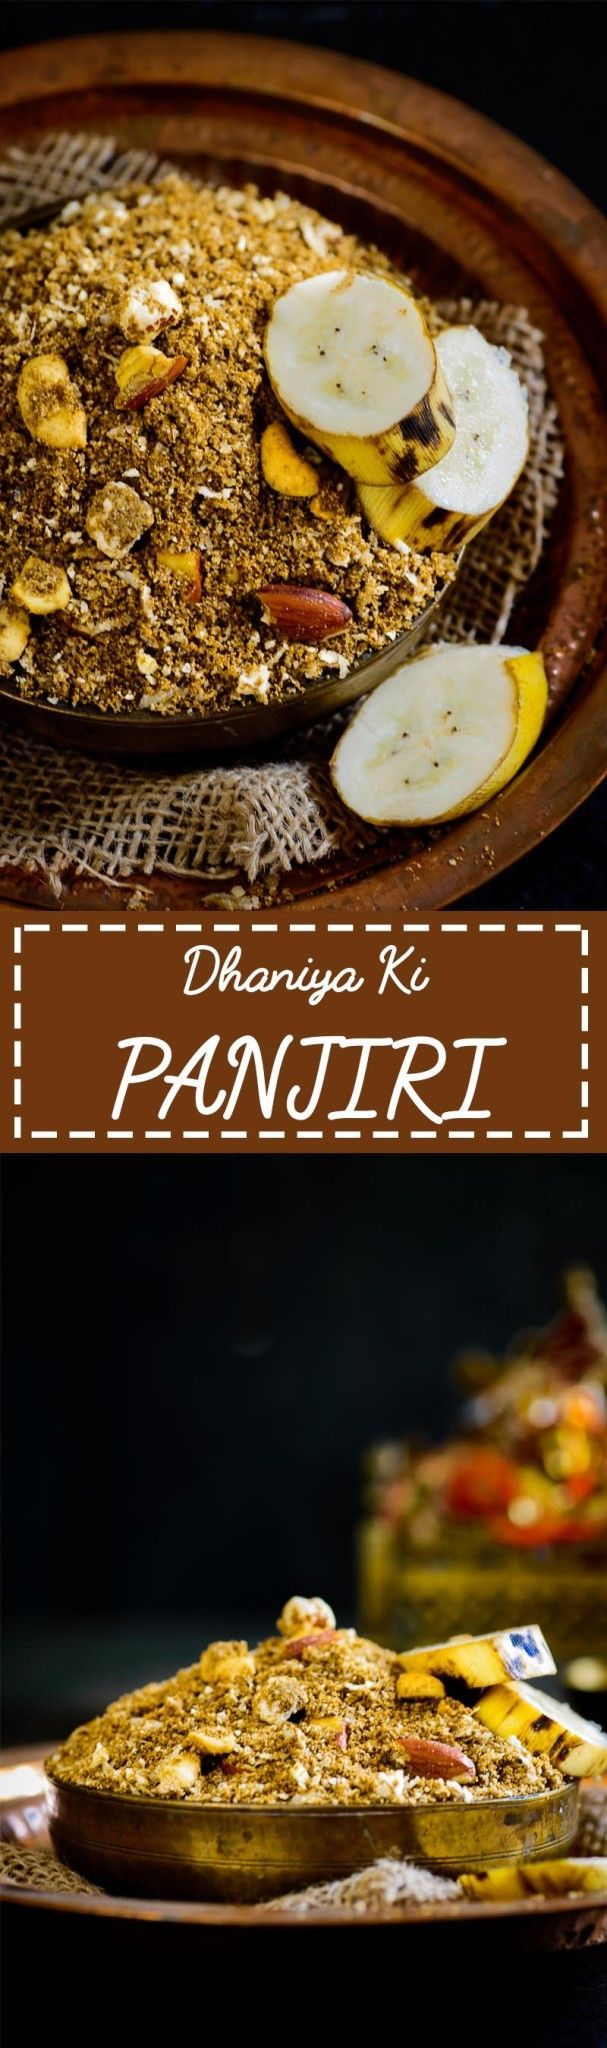 Dhaniya Panjiri is a falahari dish especially made for Krishna Janamashtami as Prashad. Here is how to make this delicious Dhaniya Ki Panjiri. #Indian #Sweet #Fasting #Vrat